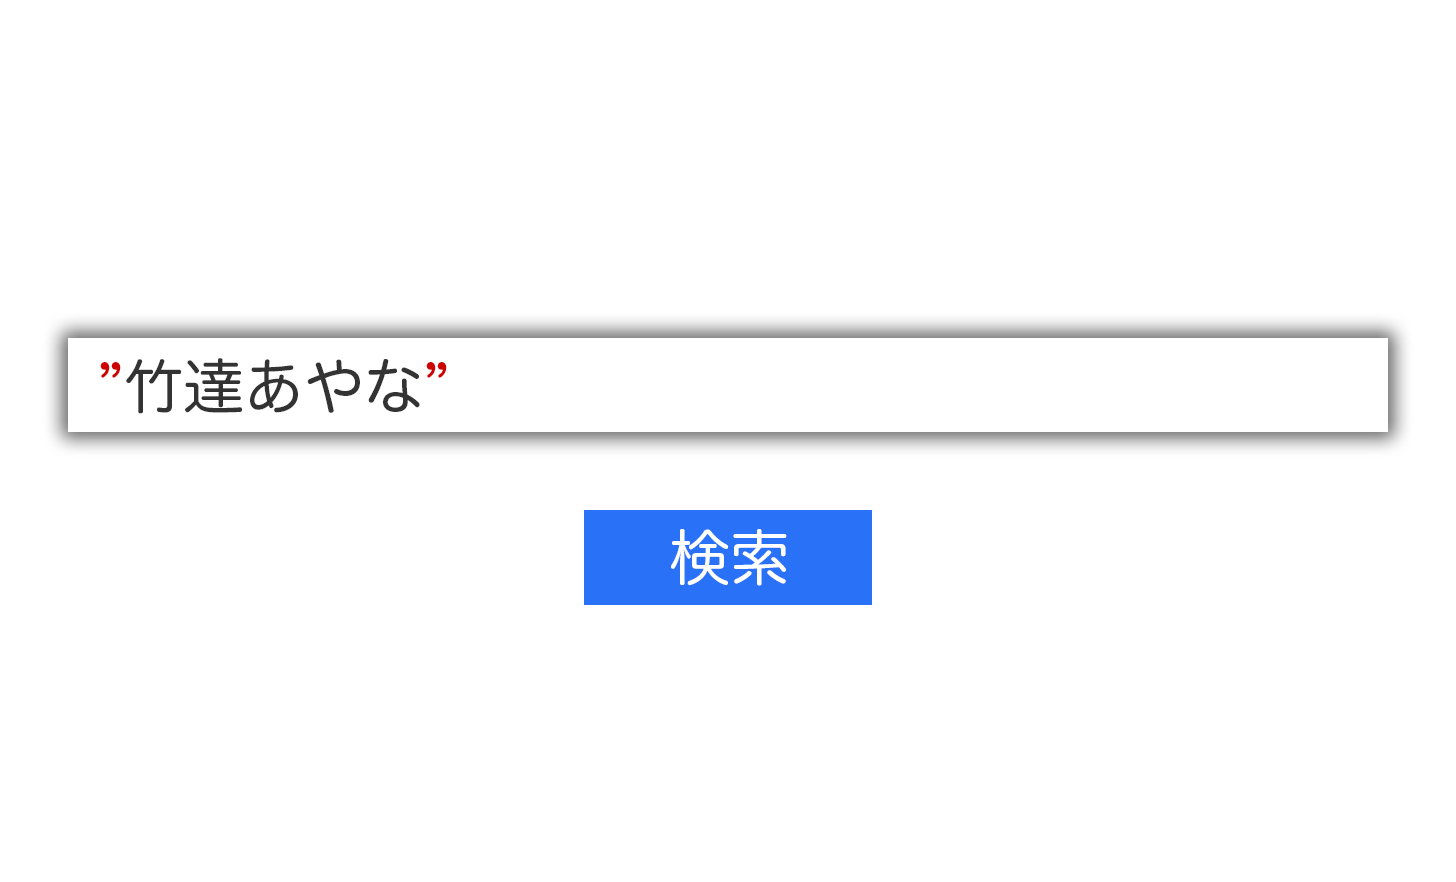 Gmailで完全一致検索する方法。